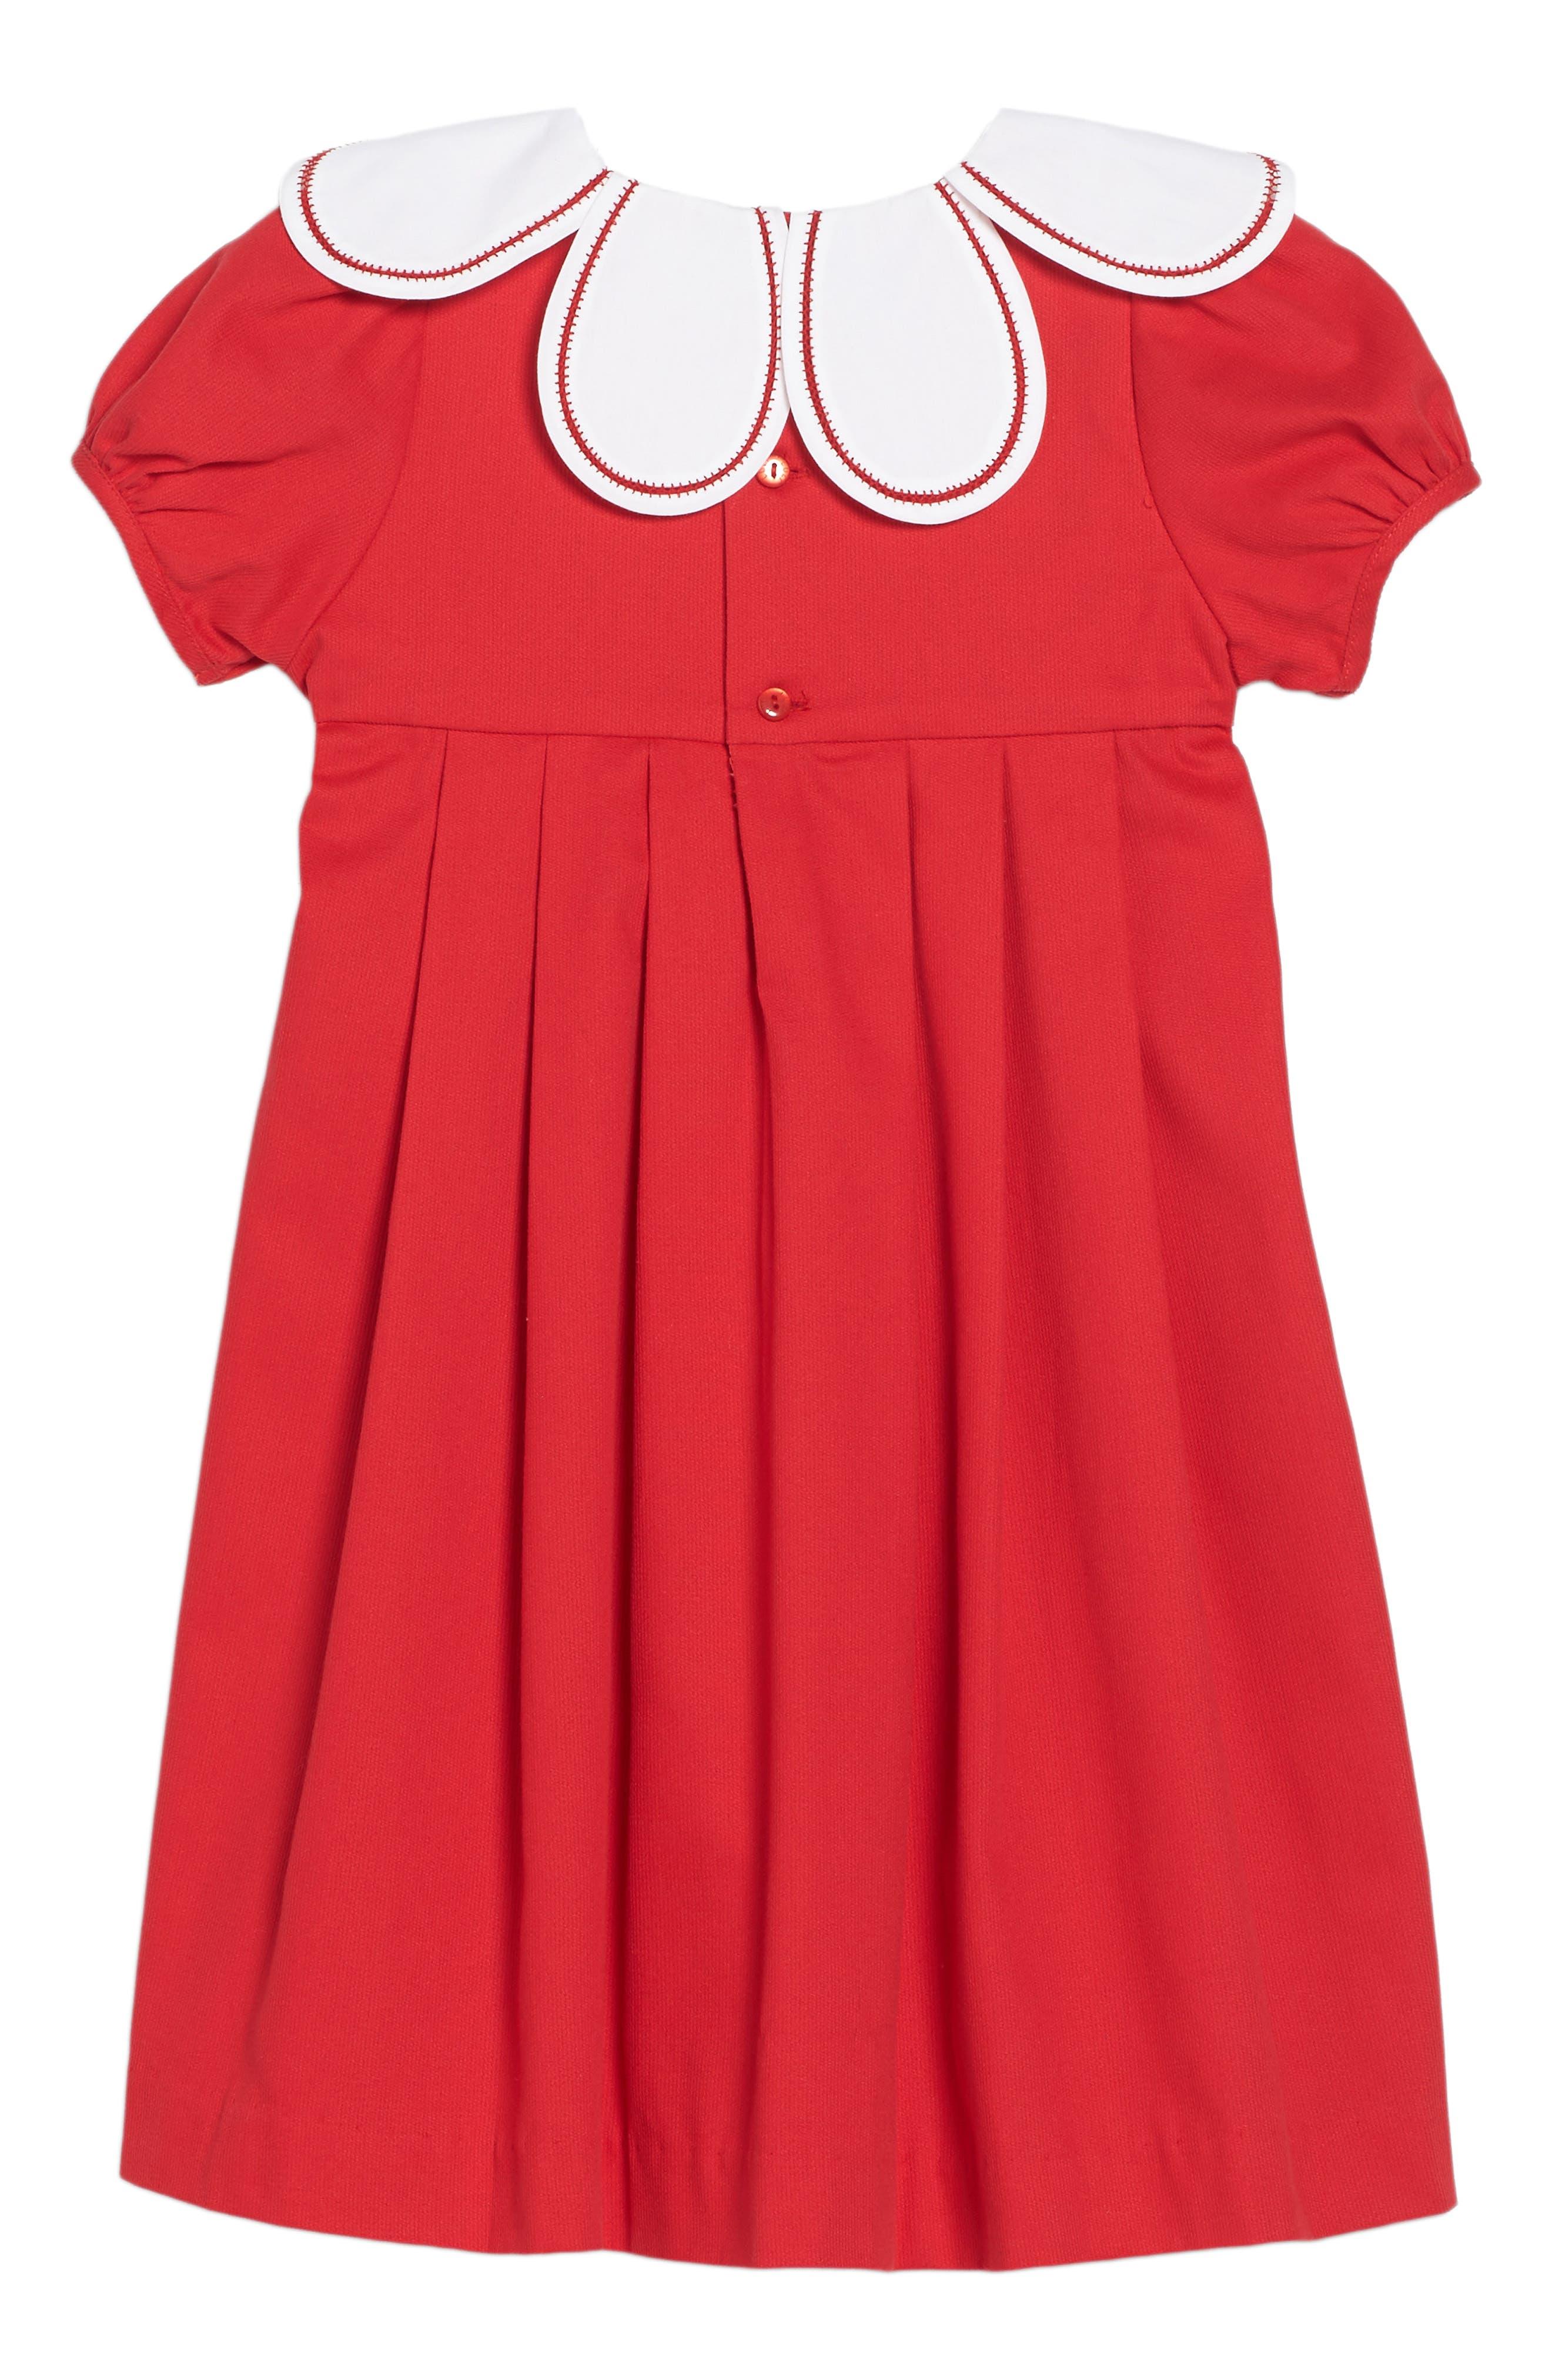 Alternate Image 2  - Luli & Me Daisy Collar Corduroy Dress (Toddler Girls)